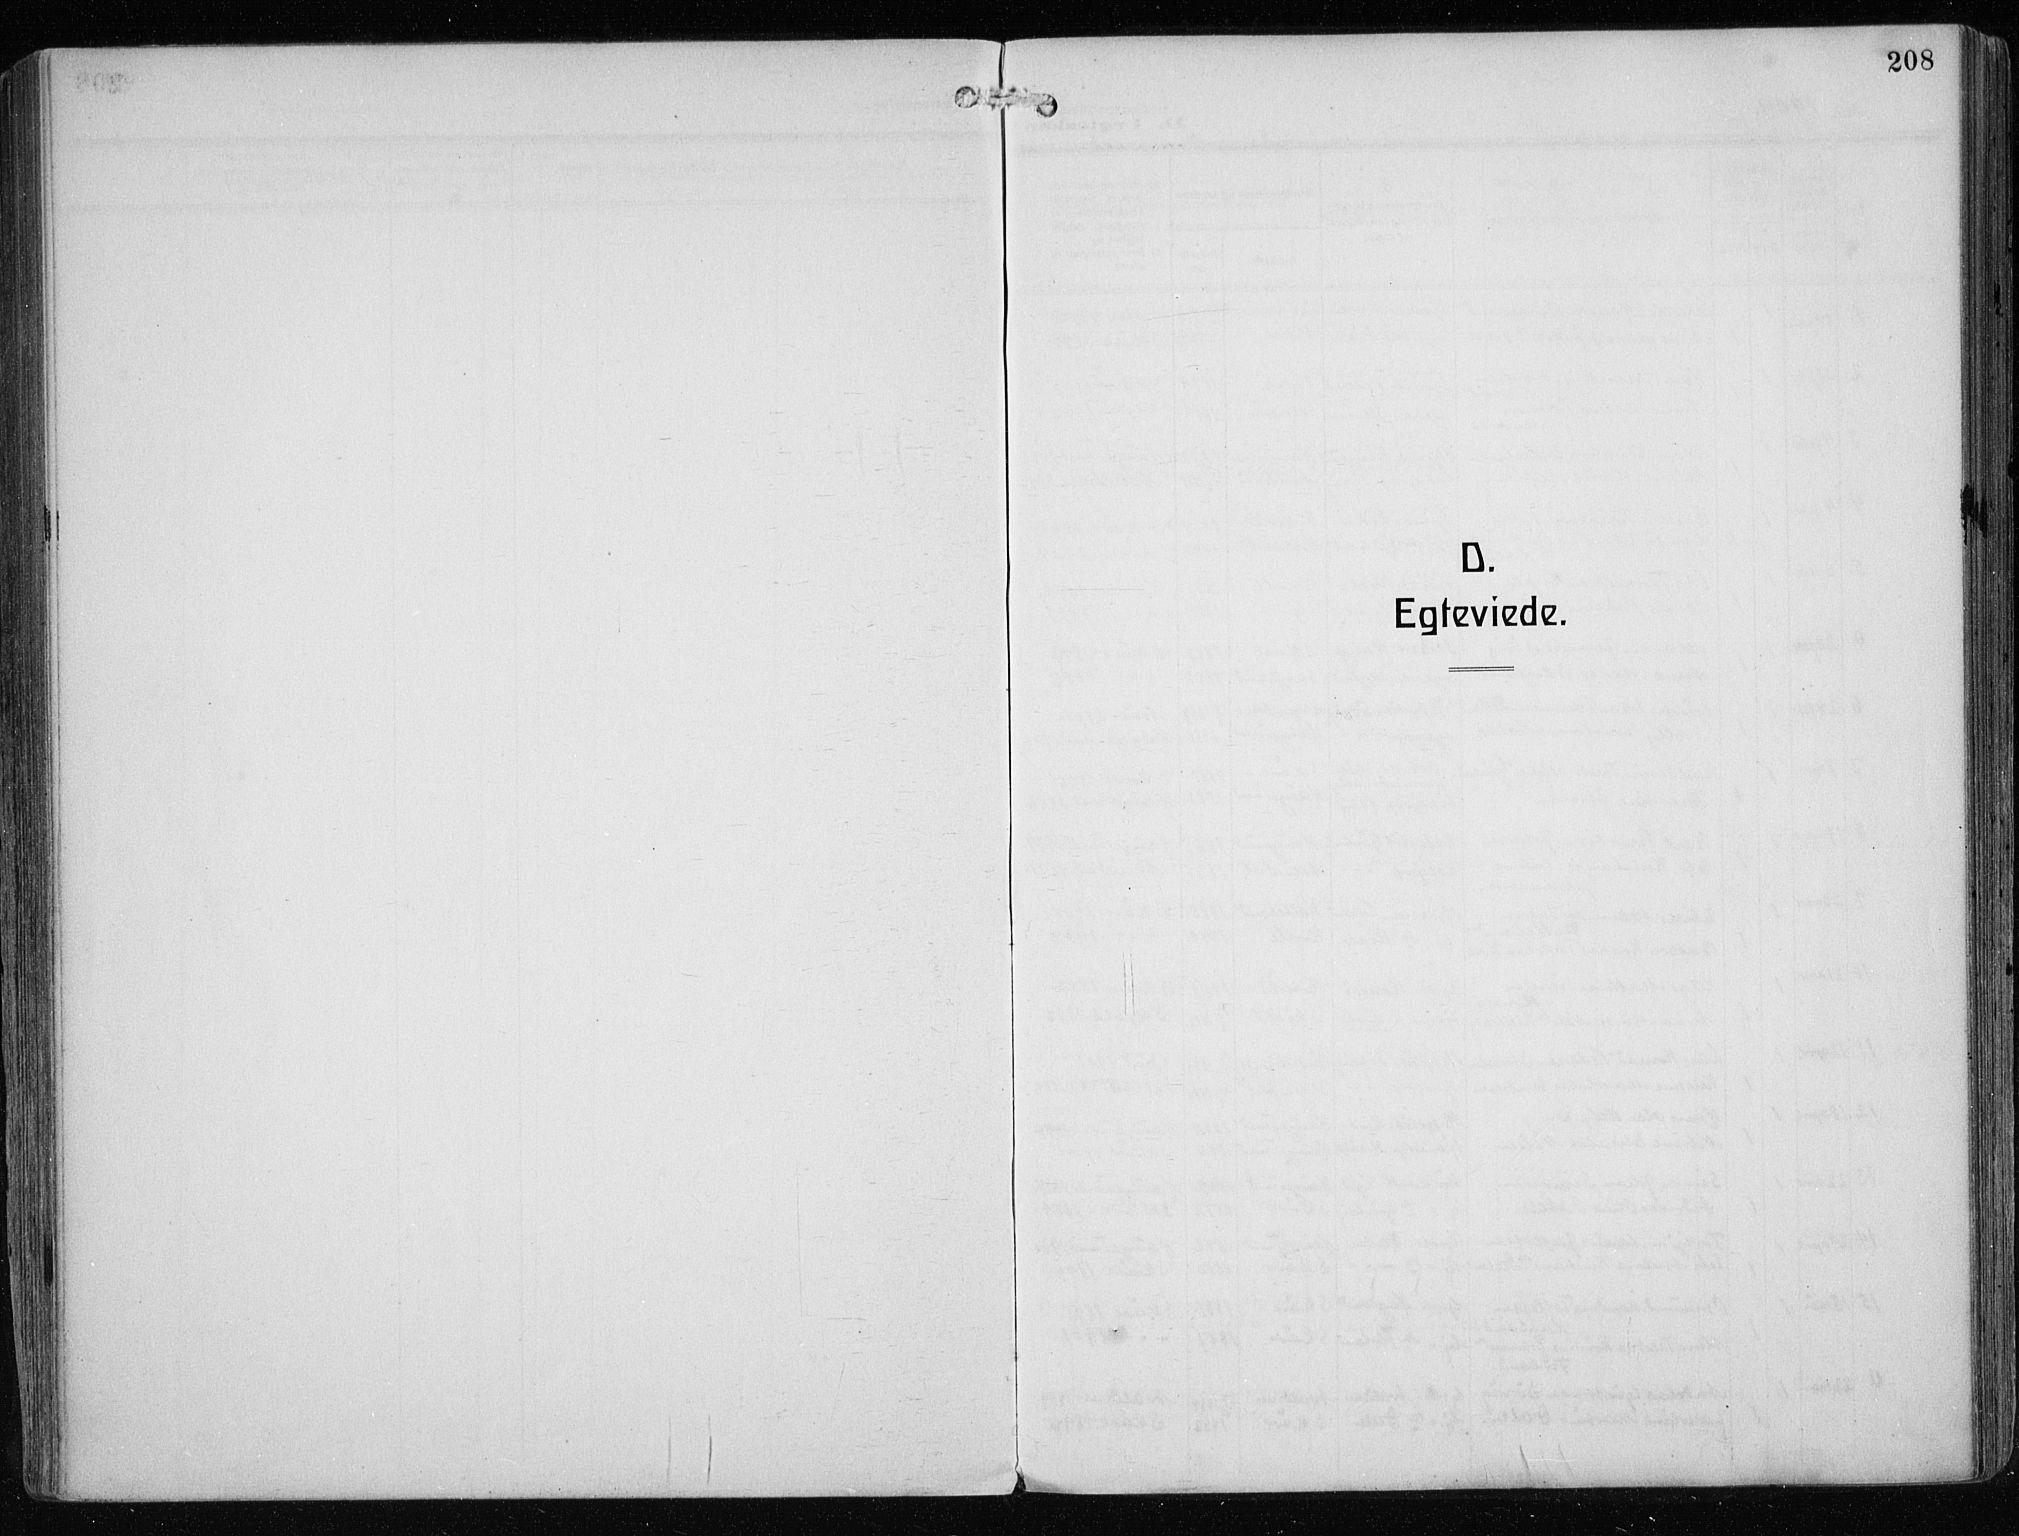 SAST, Haugesund sokneprestkontor, H/Ha/Haa/L0010: Ministerialbok nr. A 10, 1909-1935, s. 208